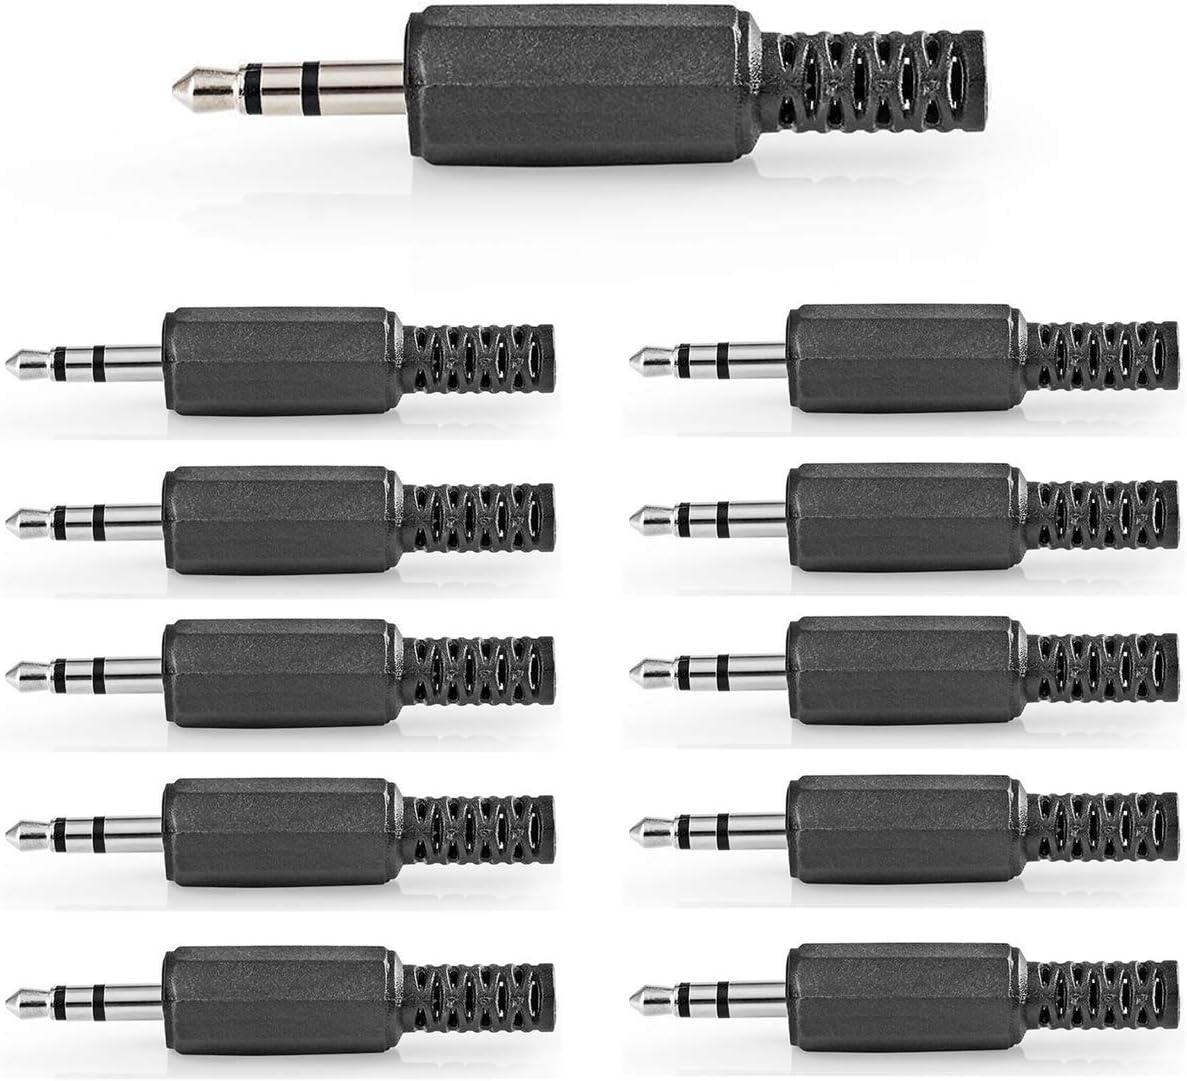 10 x Klinkenkupplung 3,5mm Stereo 3-polig Knickschutz Kunststoff Schwarz 7204